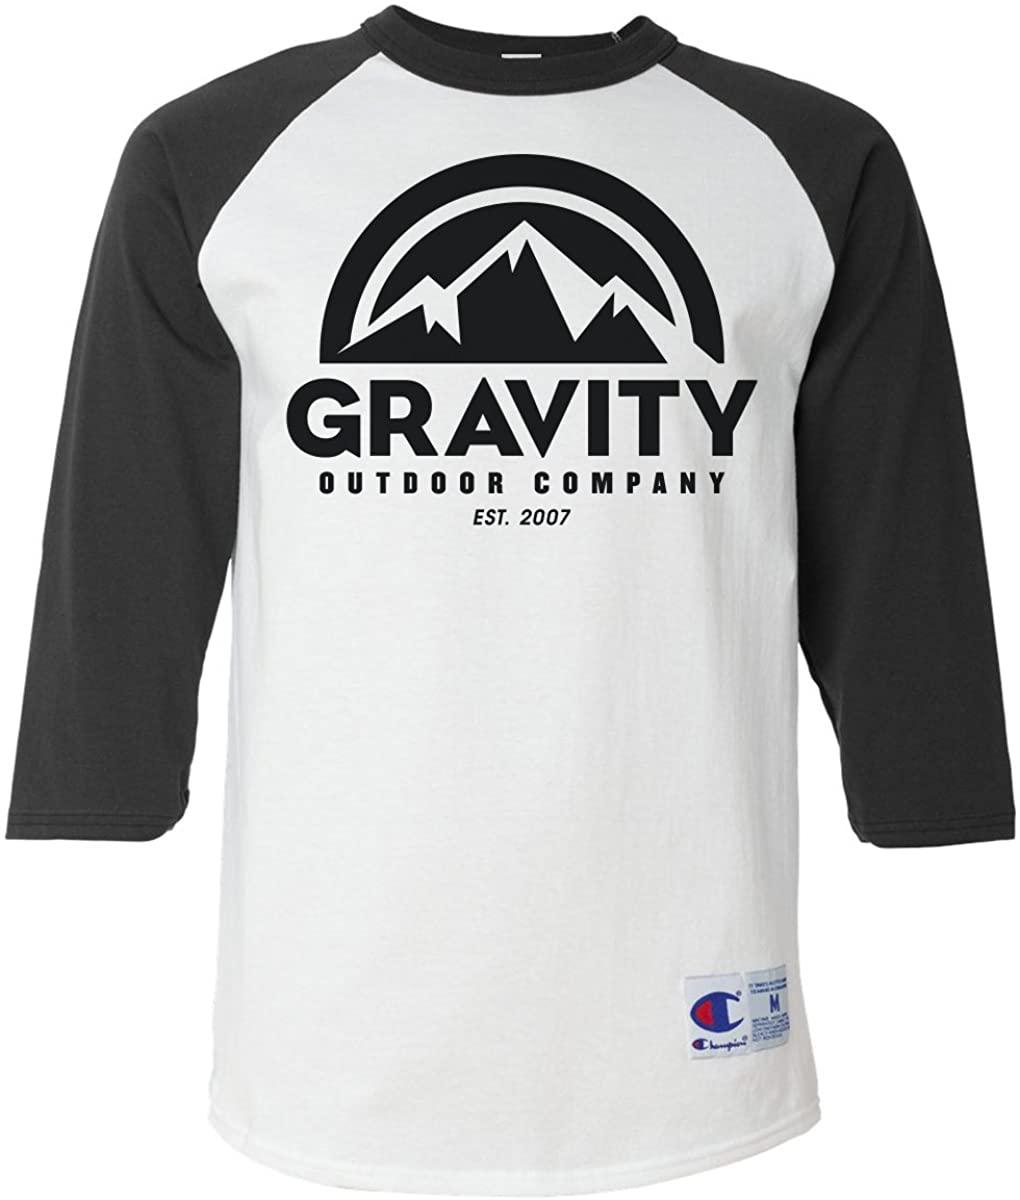 Gravity Outdoor Co. Mens Raglan T-Shirt